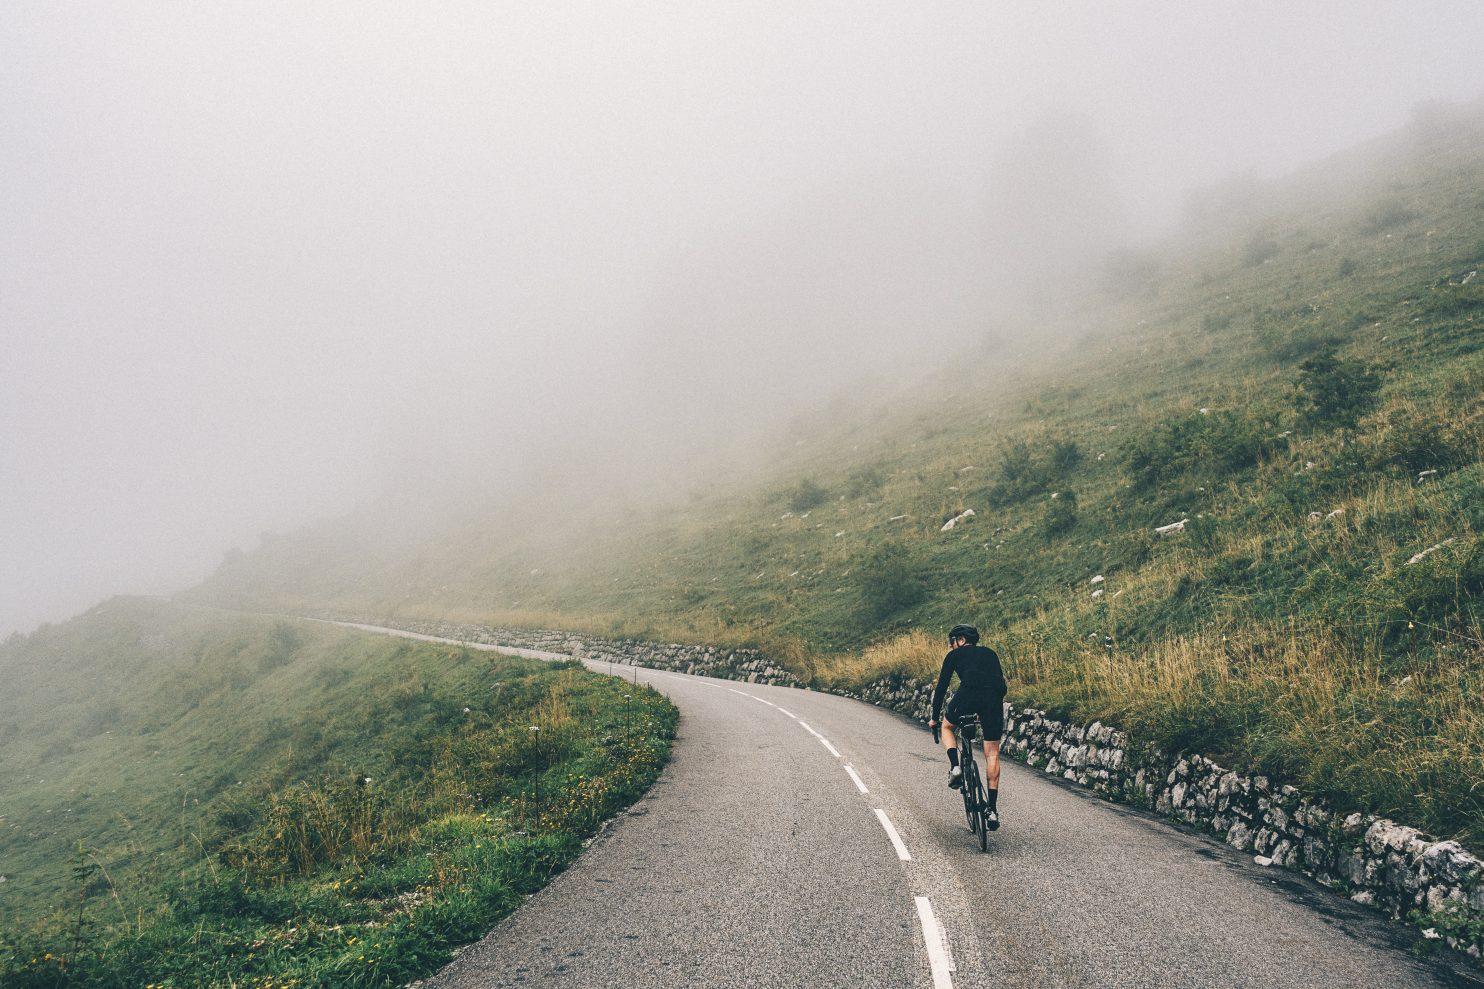 Wielrenner in de mist op de Col de la Colombière